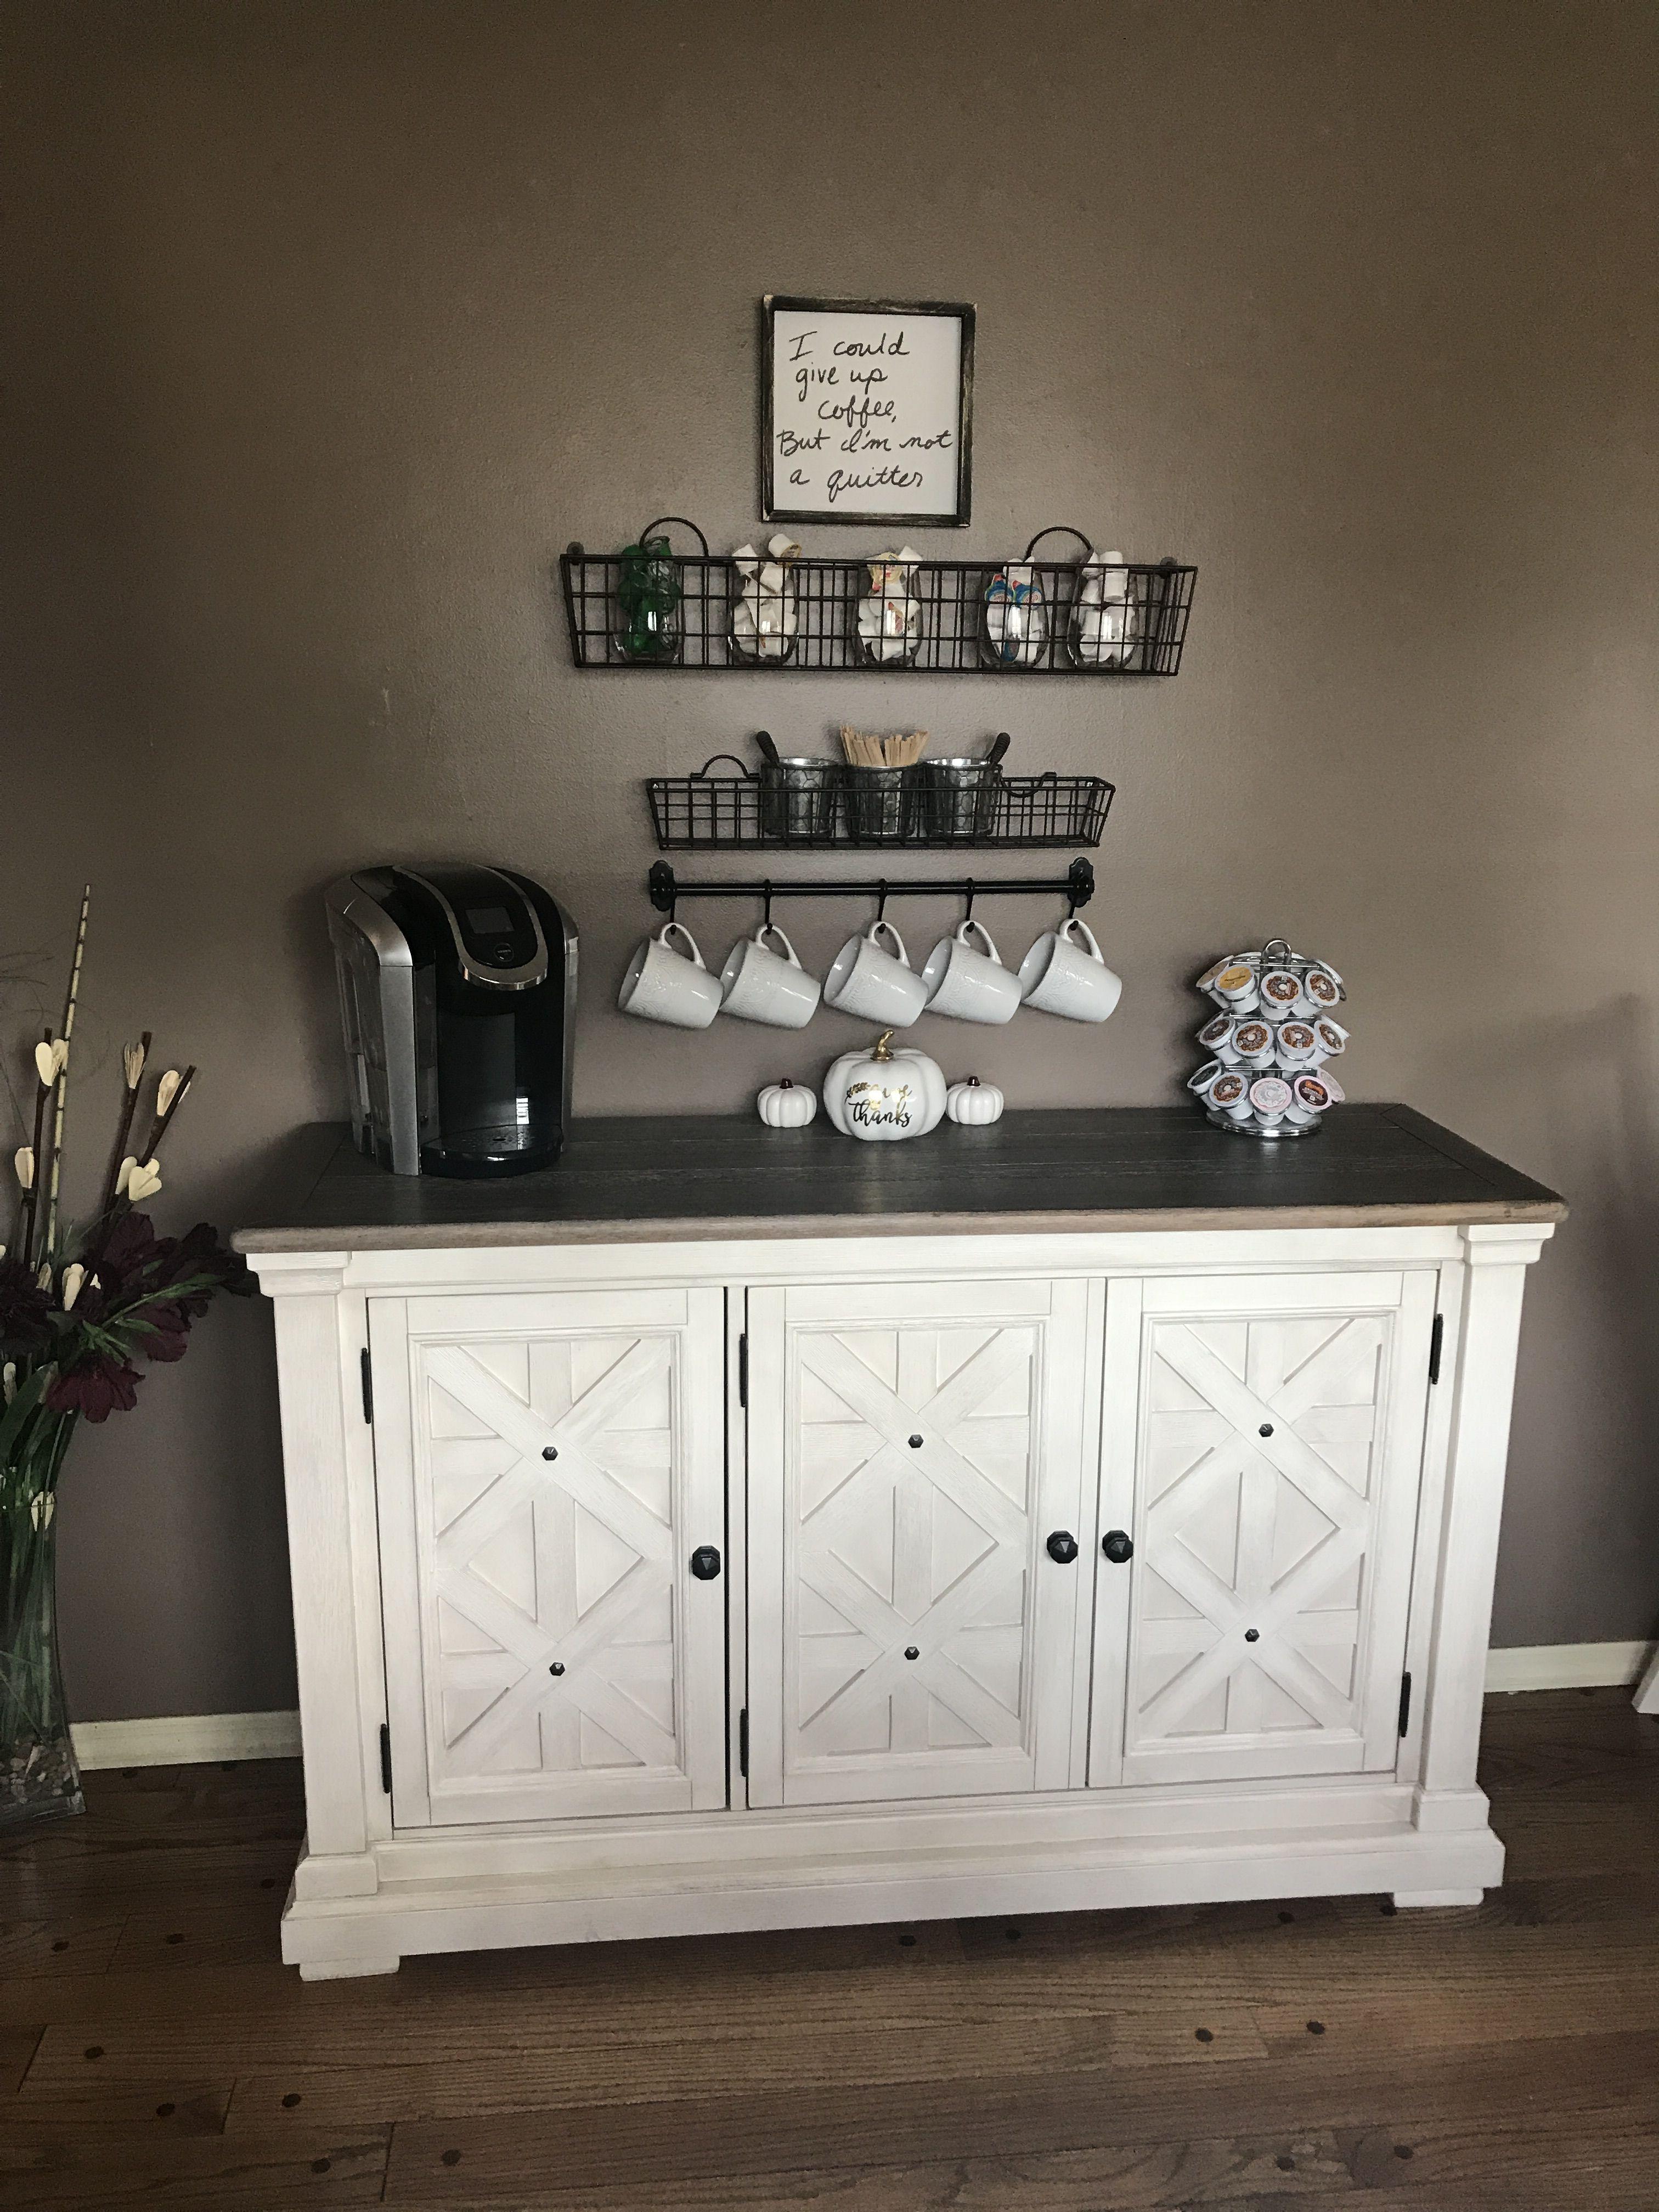 Dream Coffee Bar Farmhouse Home Inspiration Rustic Chic Rustic Glam Coffee Bar Home Home Office Furniture Rustic Dining Room